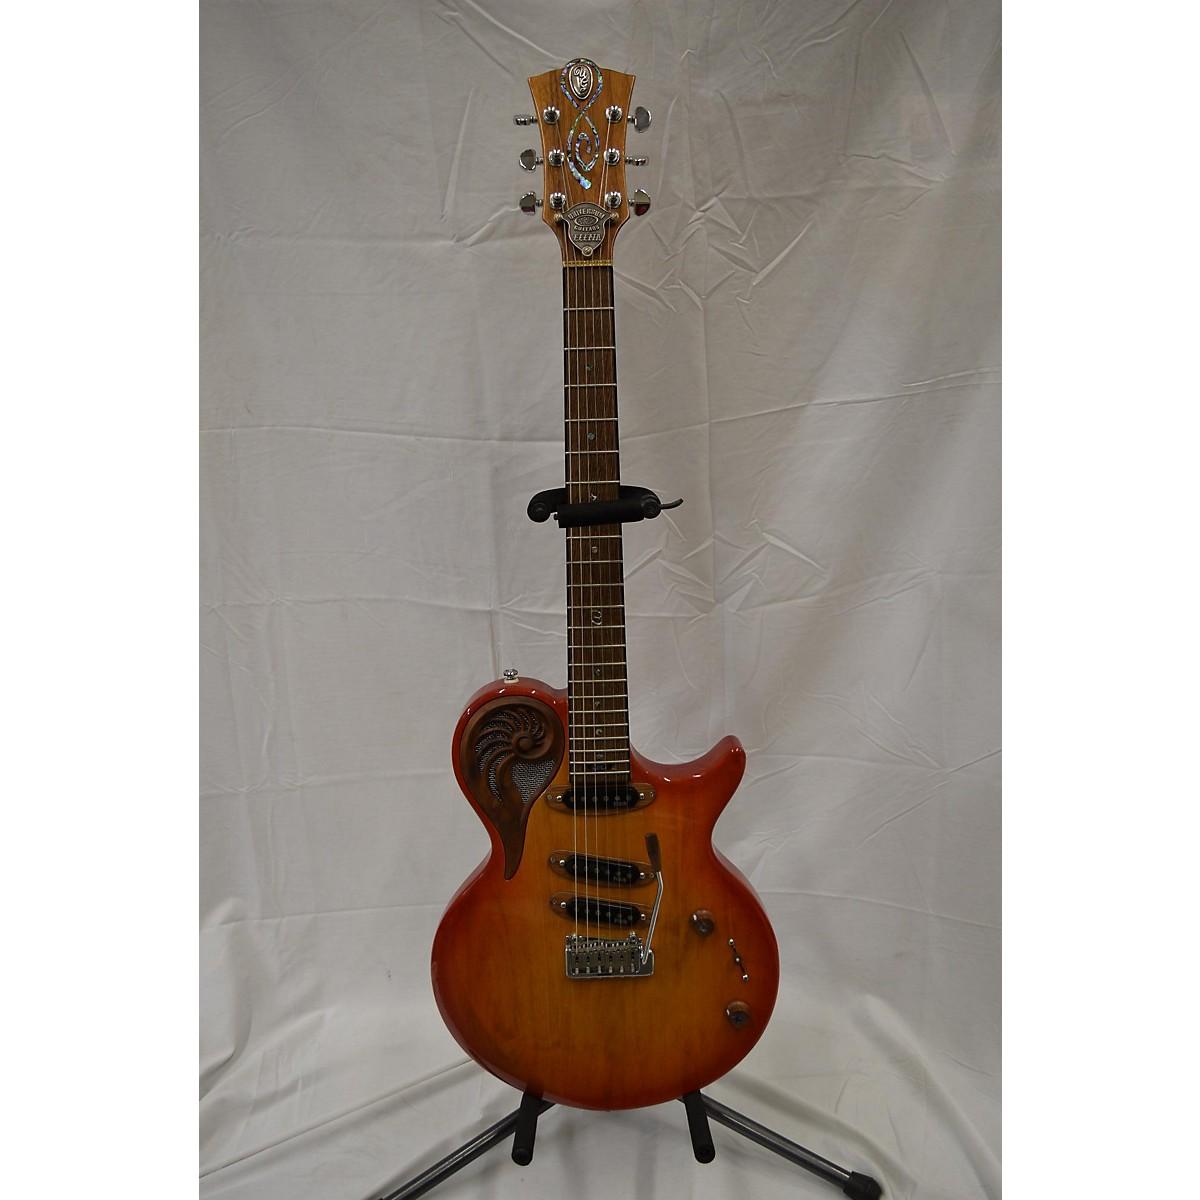 In Store Used Used Universum Elena Delta 2 Color Sunburst Solid Body Electric Guitar